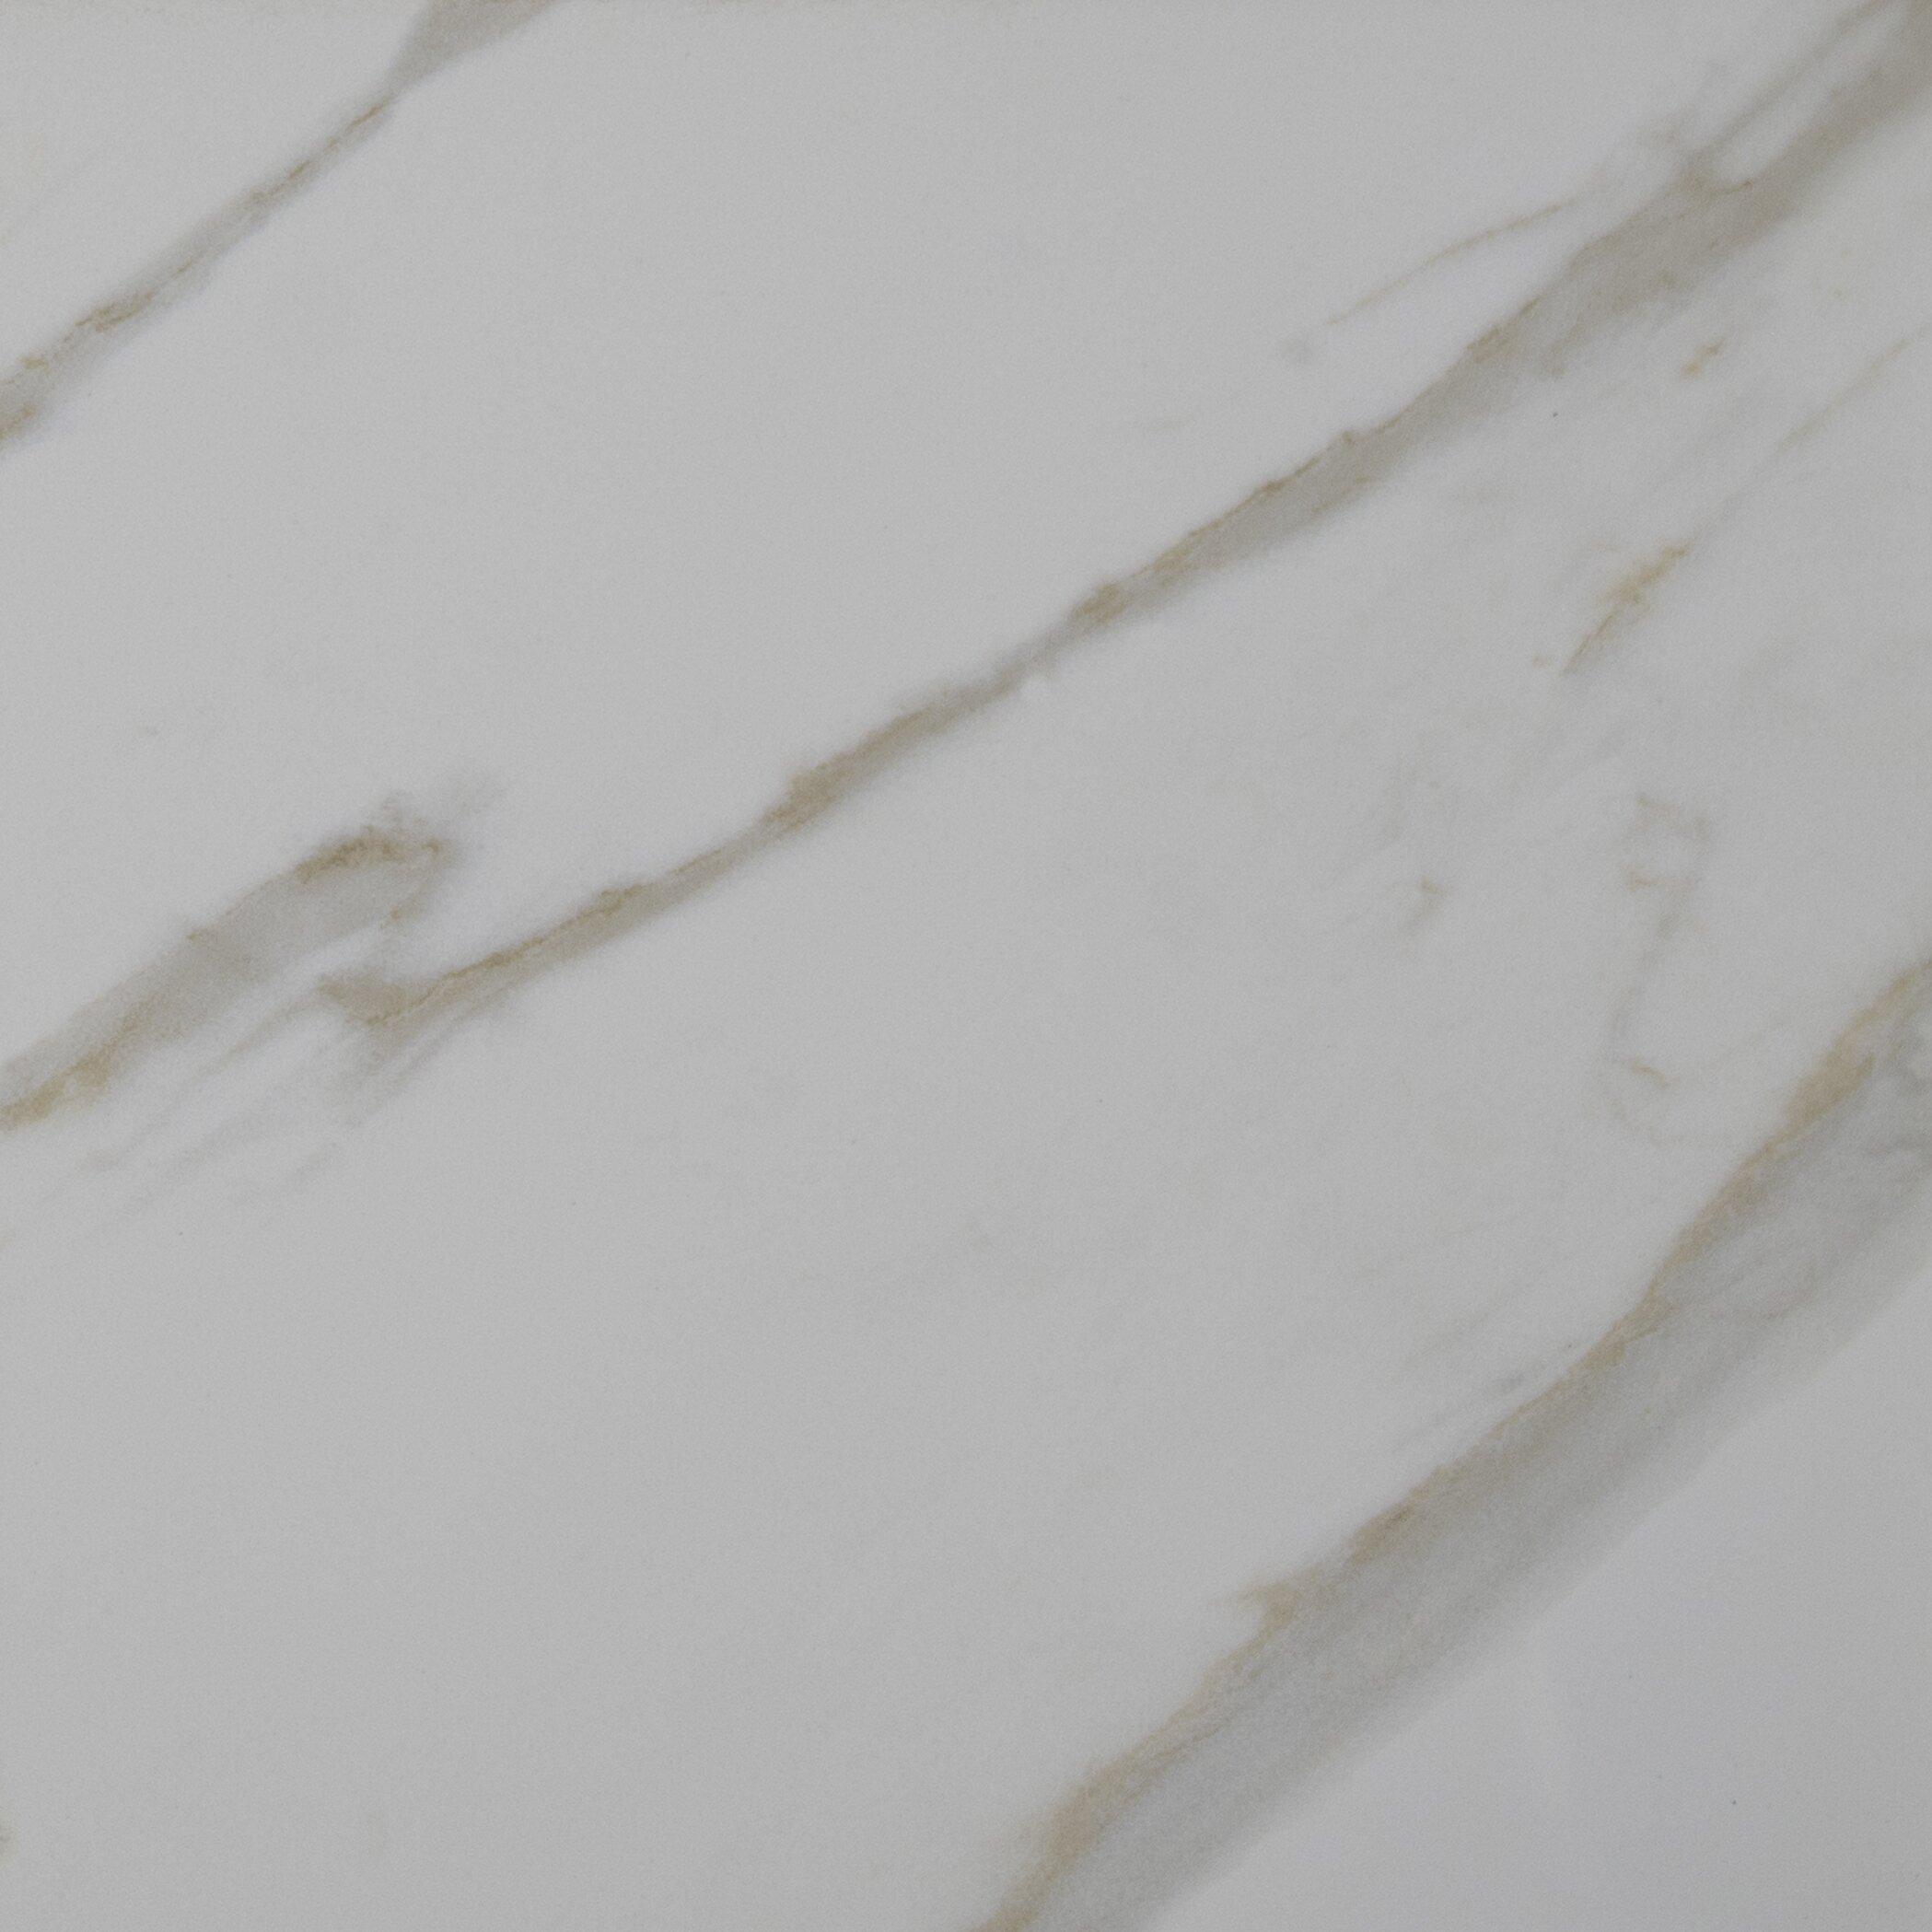 Pietra Calacatta 12 Quot X 12 Quot Porcelain Field Tile In White